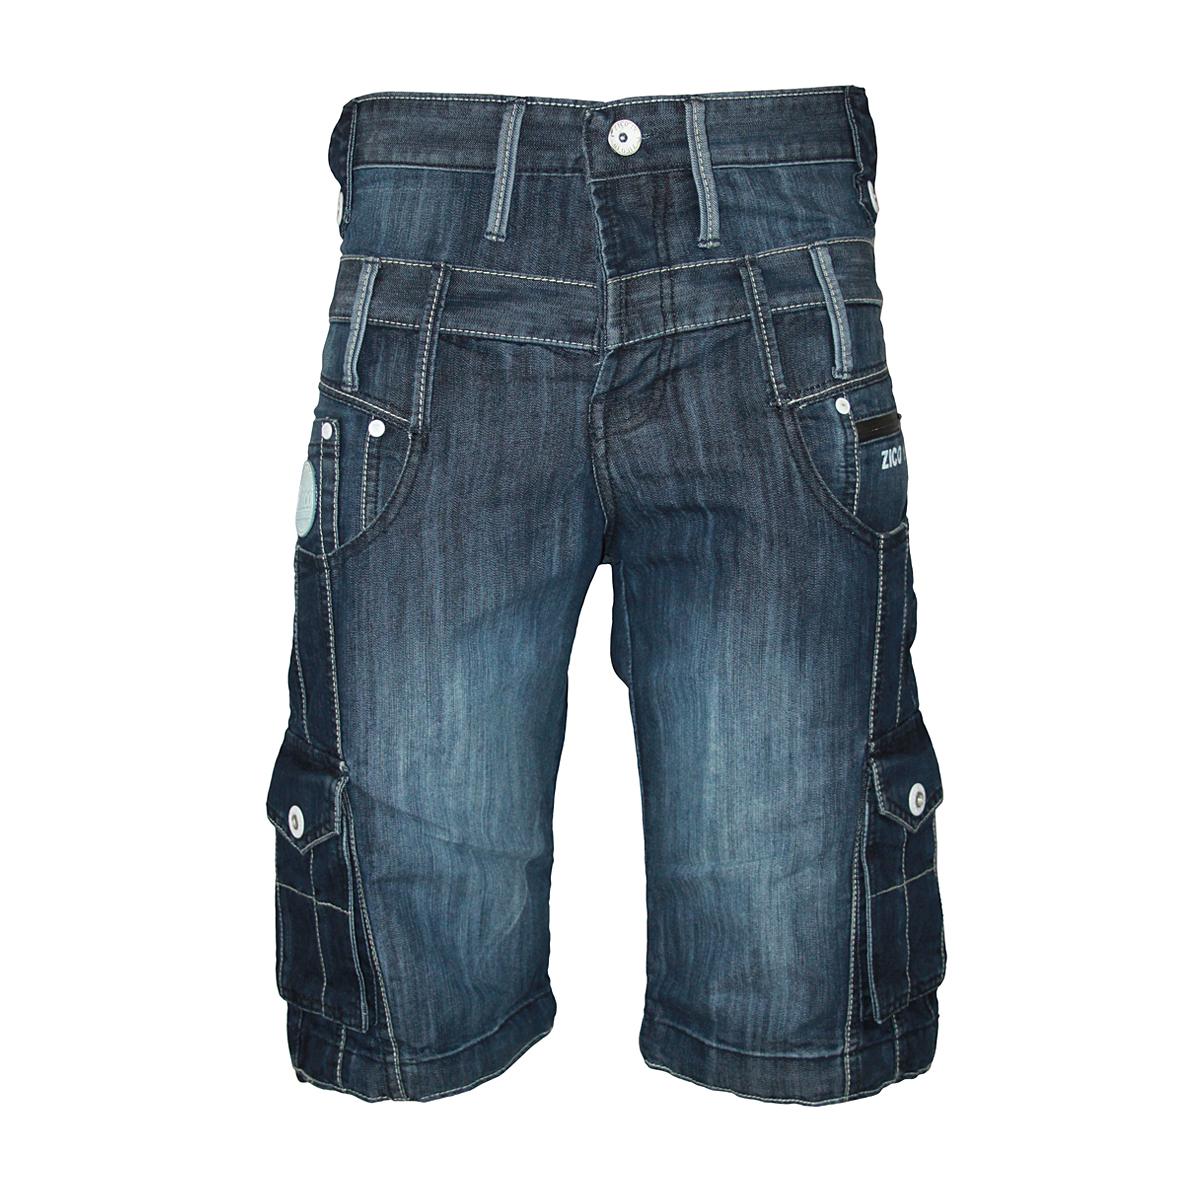 New Mens Stonewash Zico Jeans Mjt25 Designer Knee Length Shorts All Waist Sizes Ebay